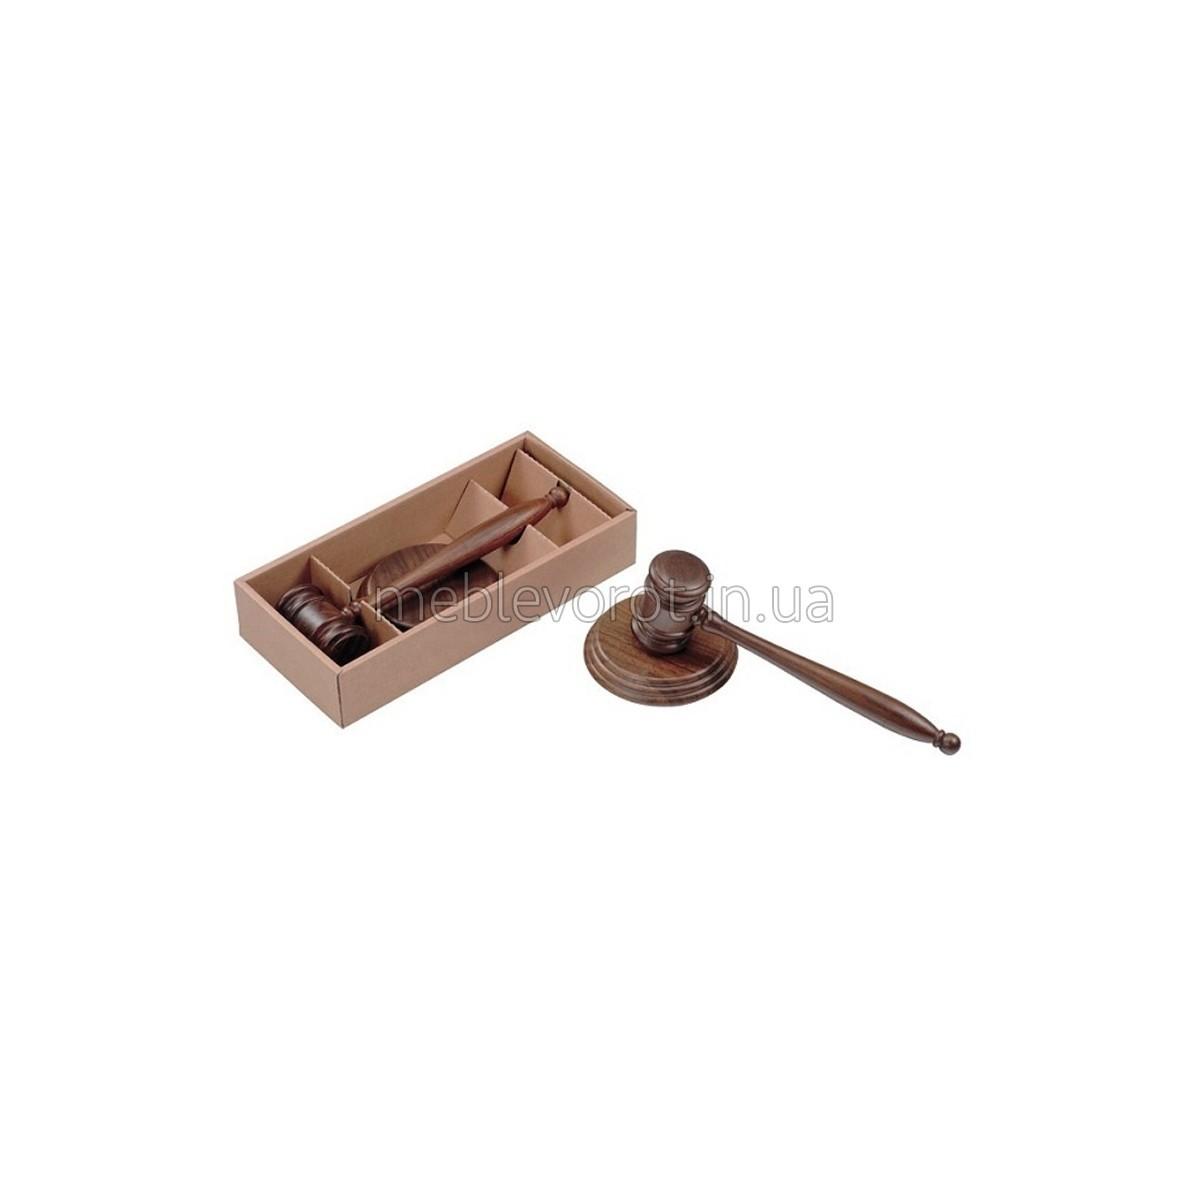 Молоток для аукциона (Аренда)